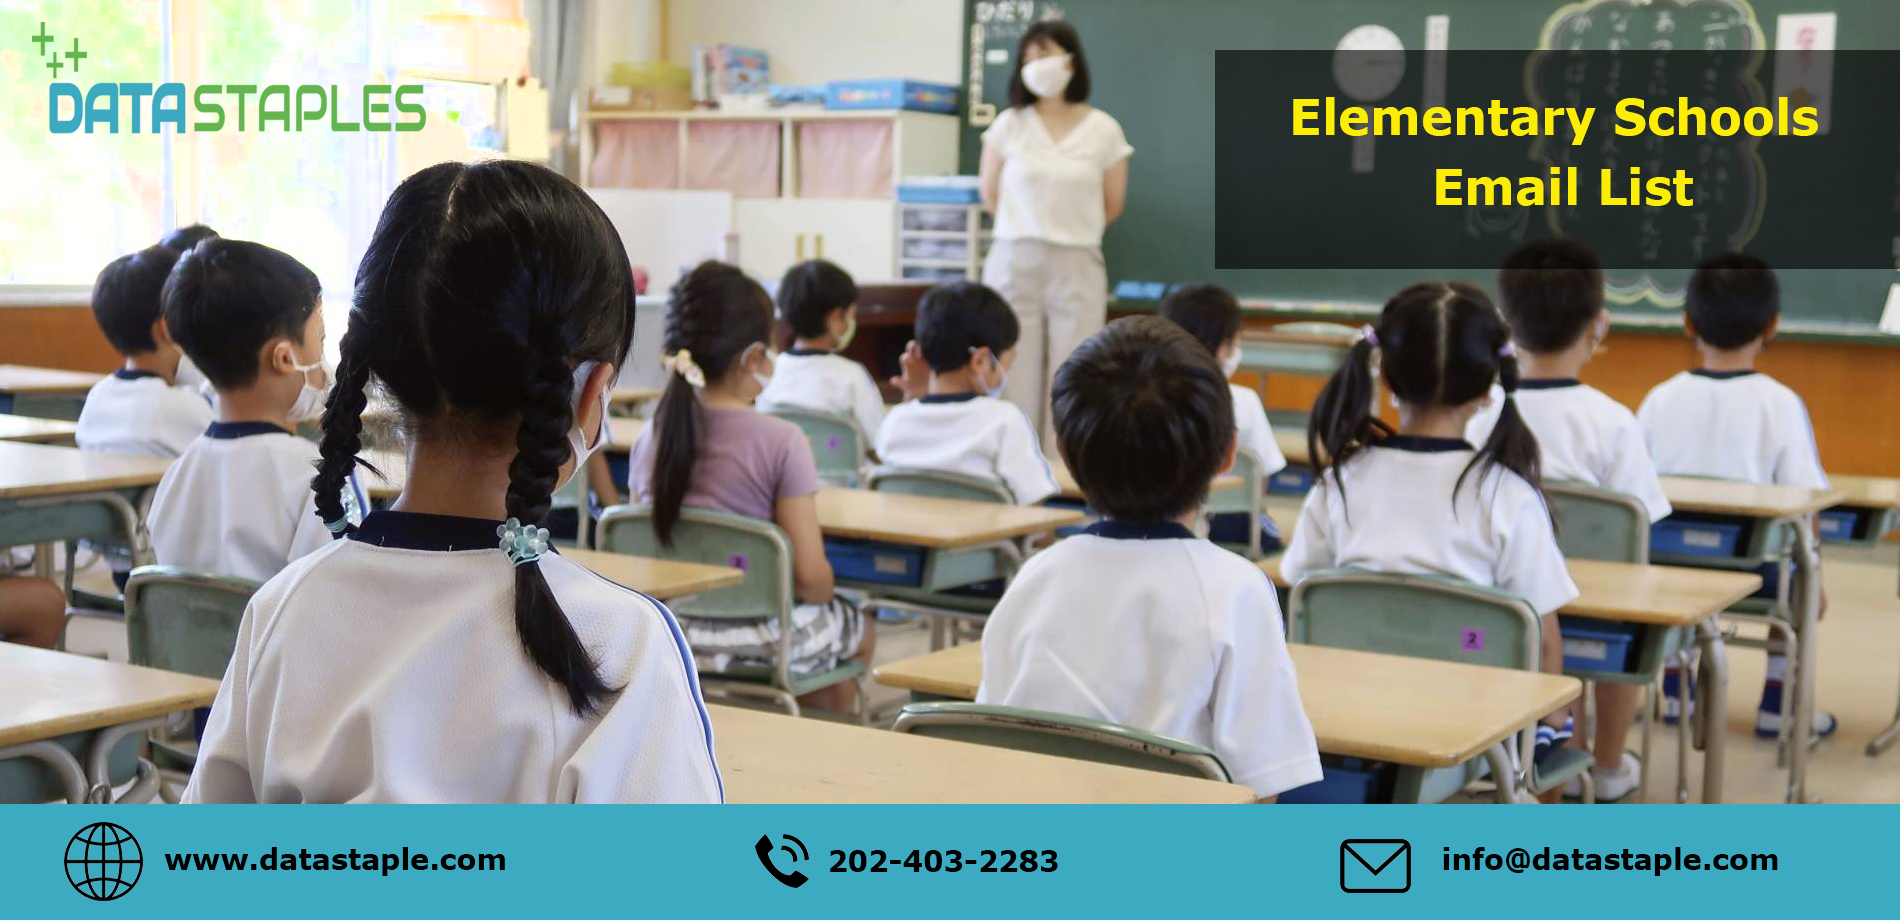 Elementary Schools Email List | DataStaples